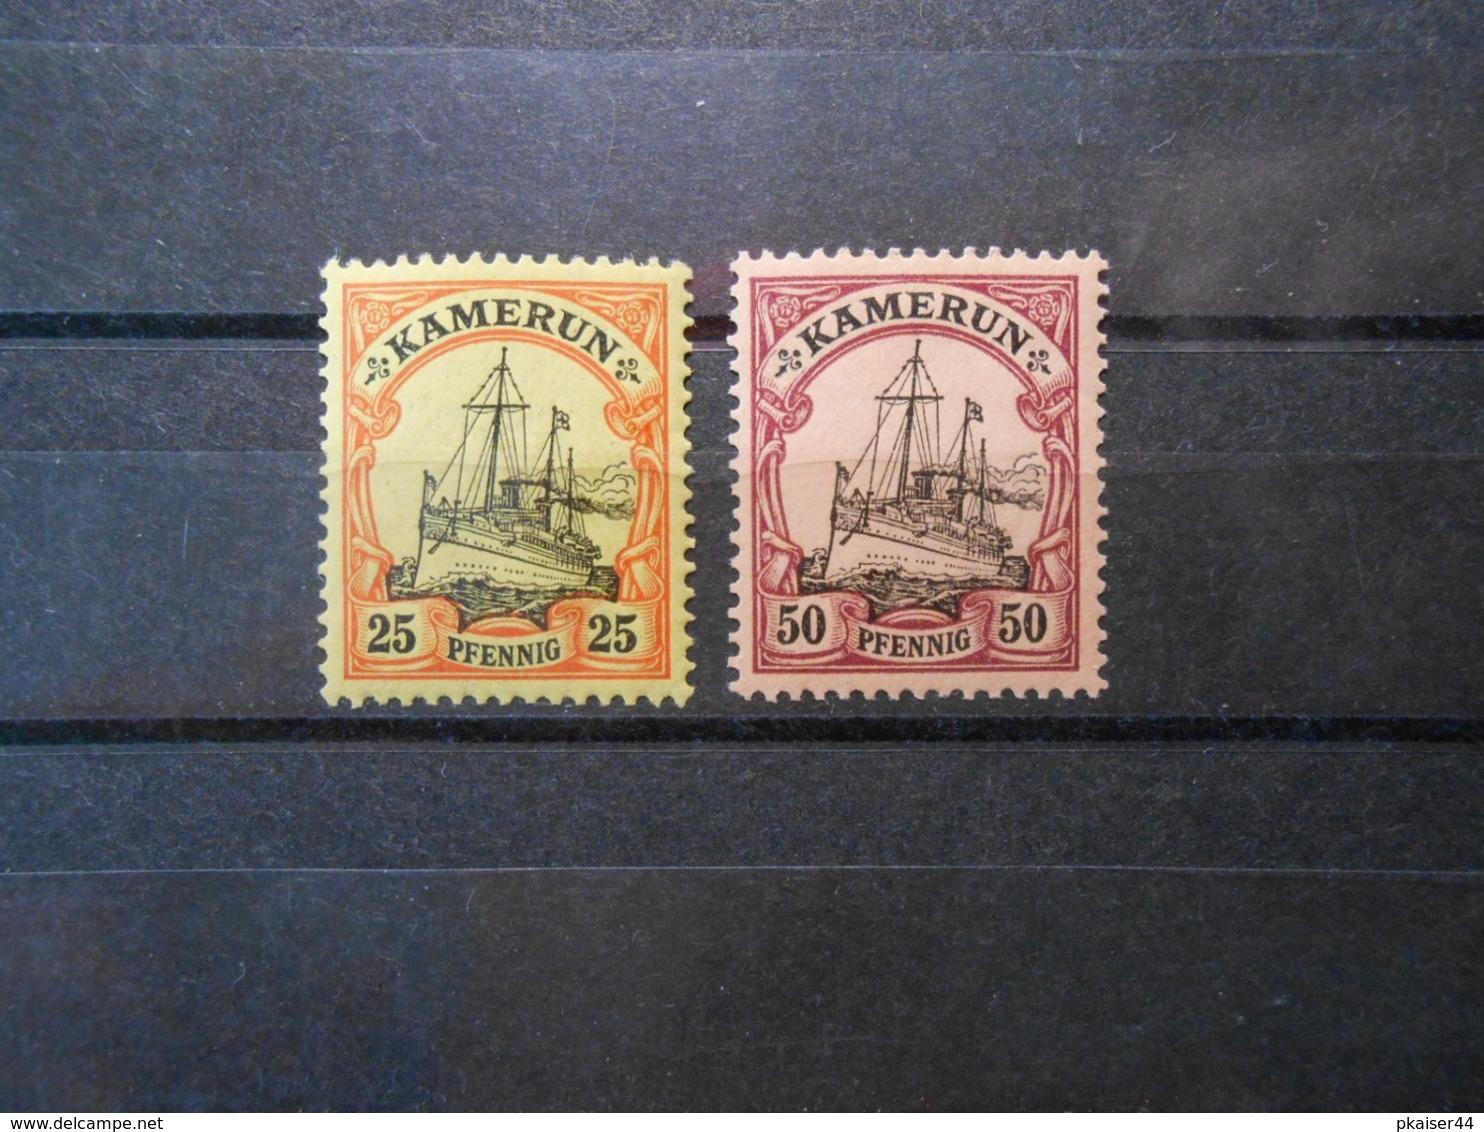 D.R.11/14  25Pf**MNH/50Pf*MLH  Deutsche Kolonien (Kamerun) 1900  Mi 7,40 € - Colonie: Cameroun